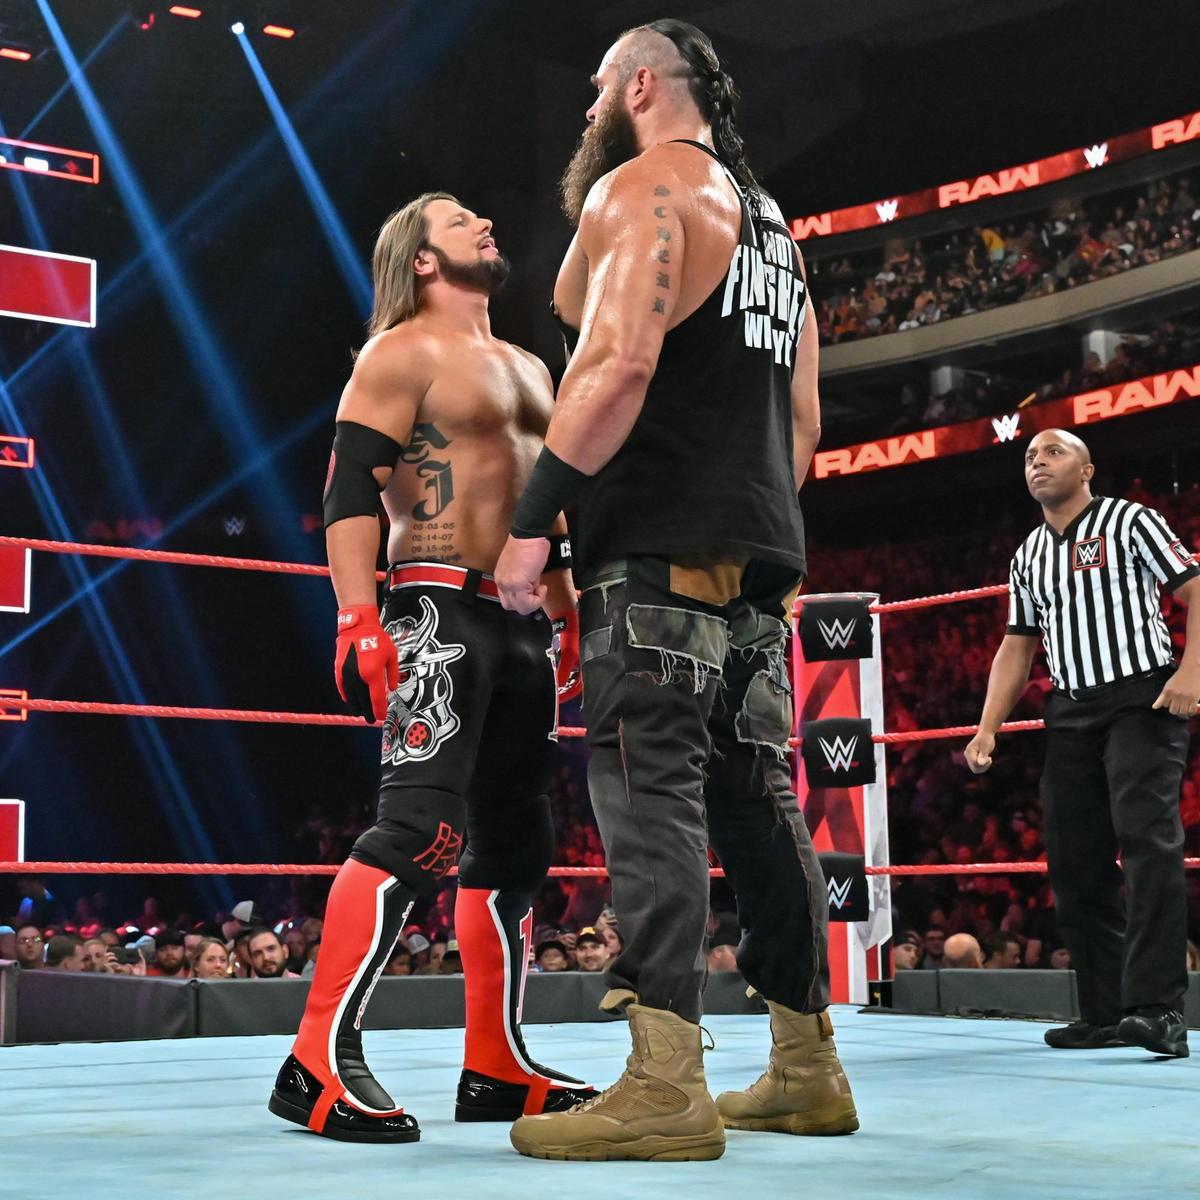 AJ Styles vs. Braun Strowman – Campeonato Estadounidense: fotos | WWE